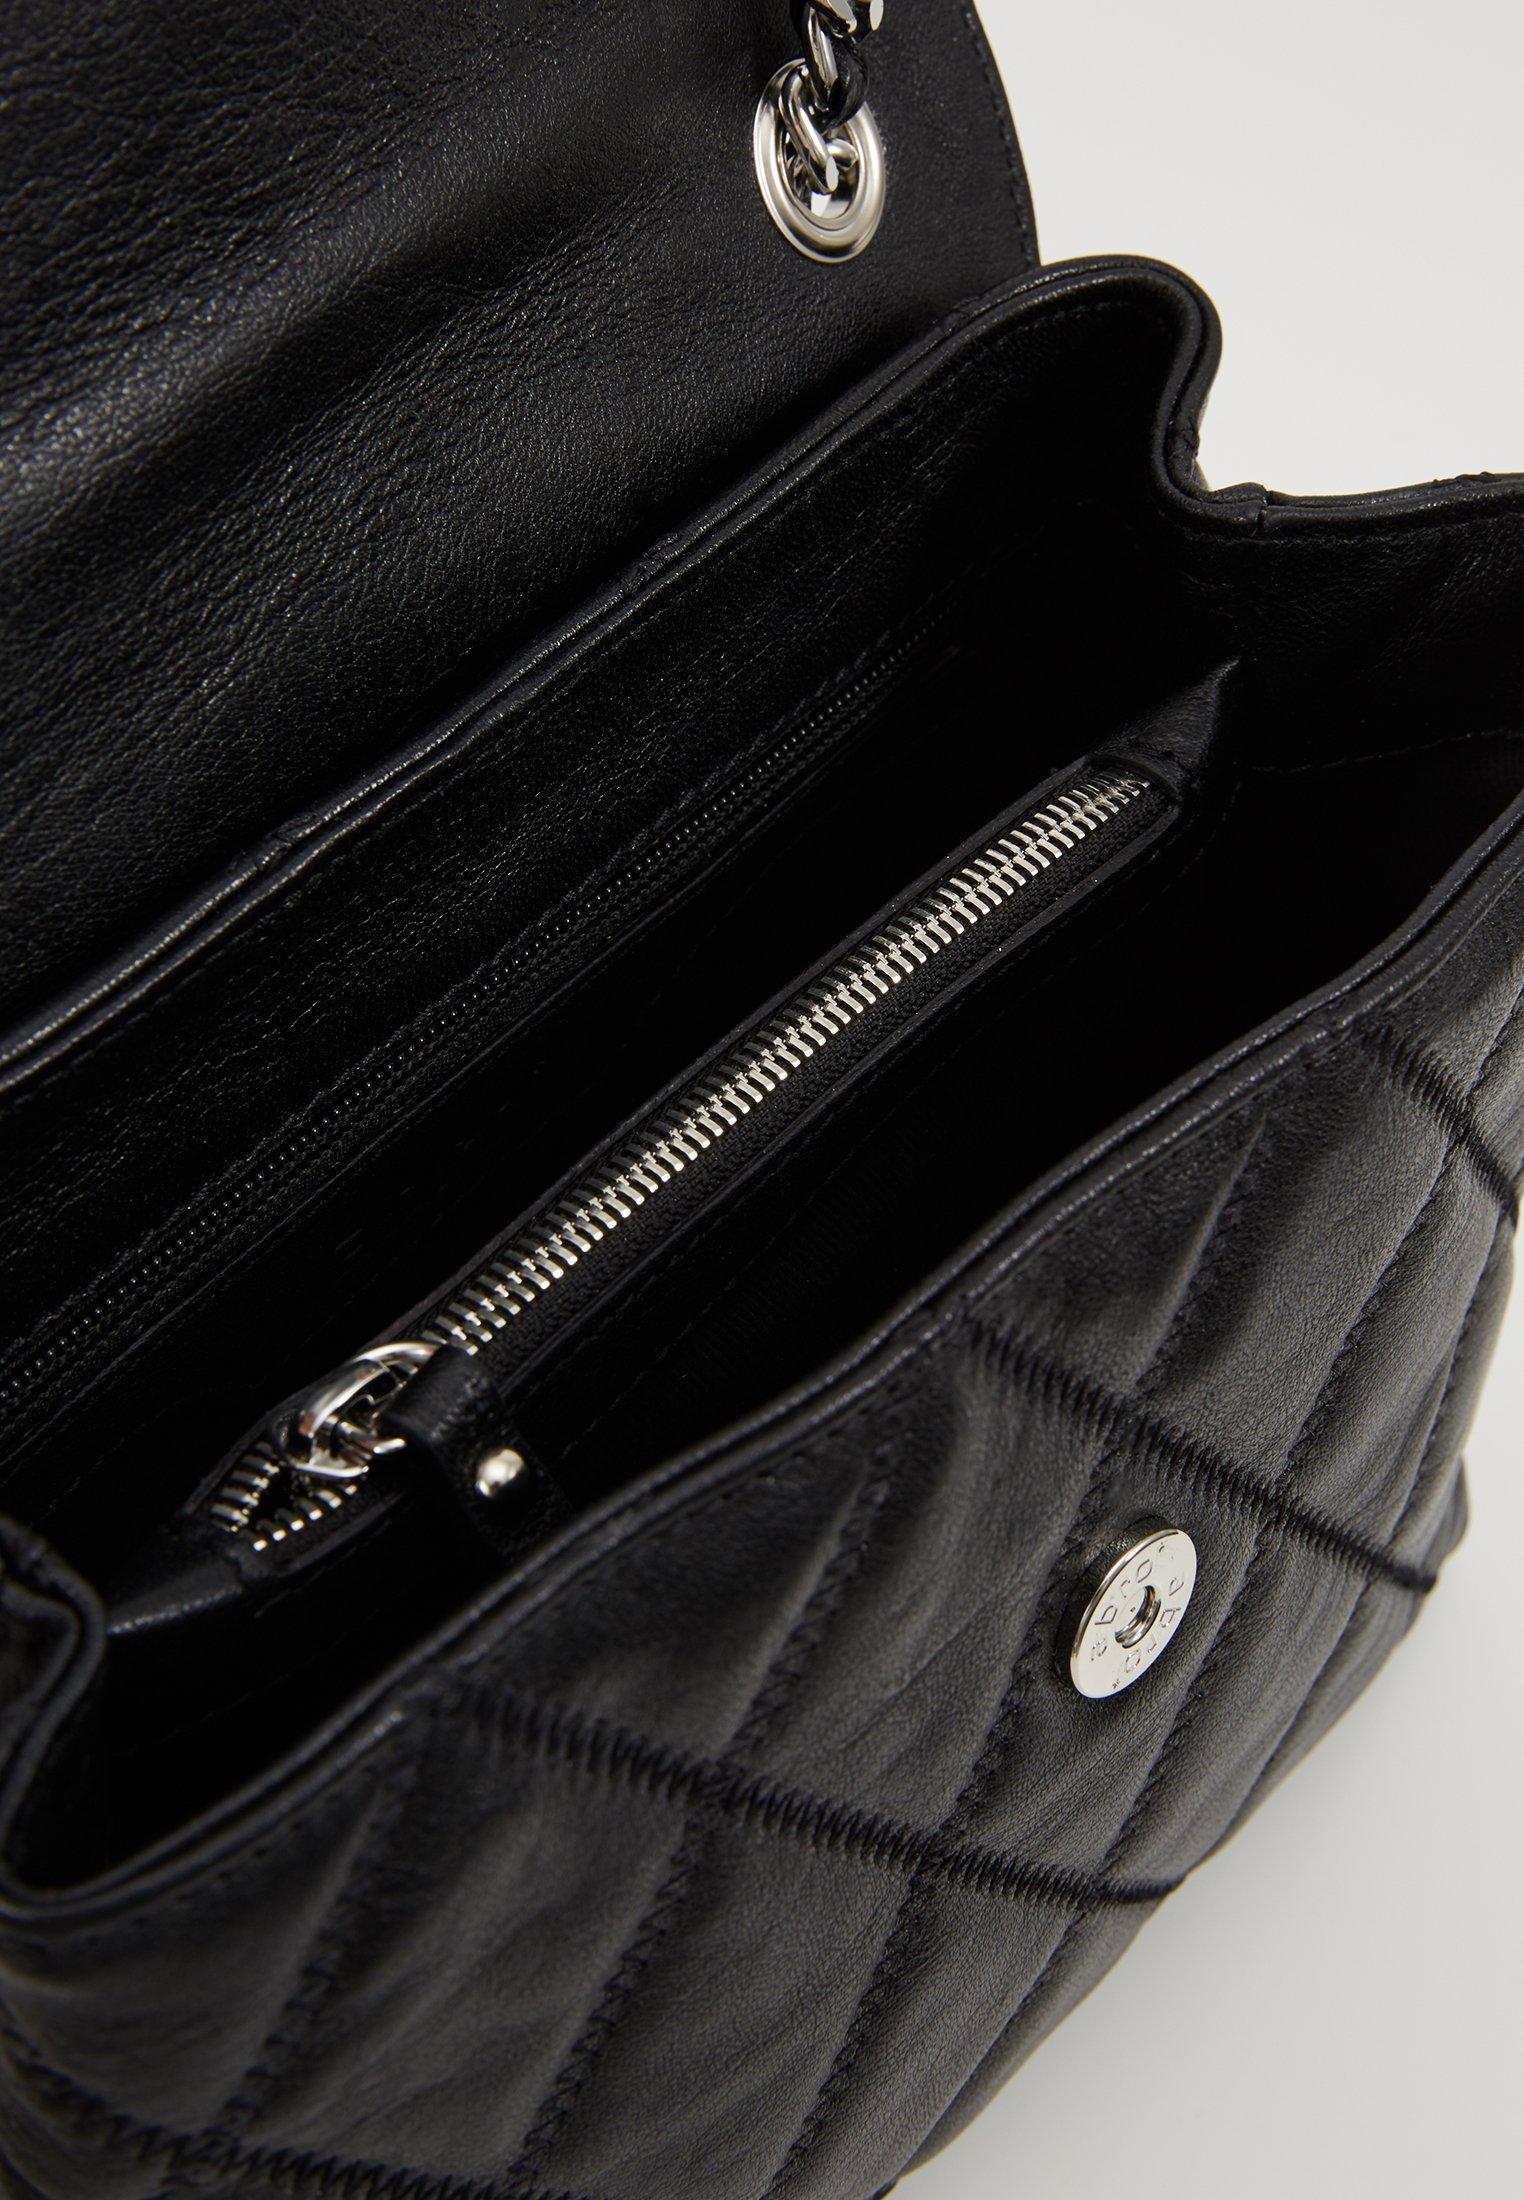 Abro Handtasche - black - Black Friday